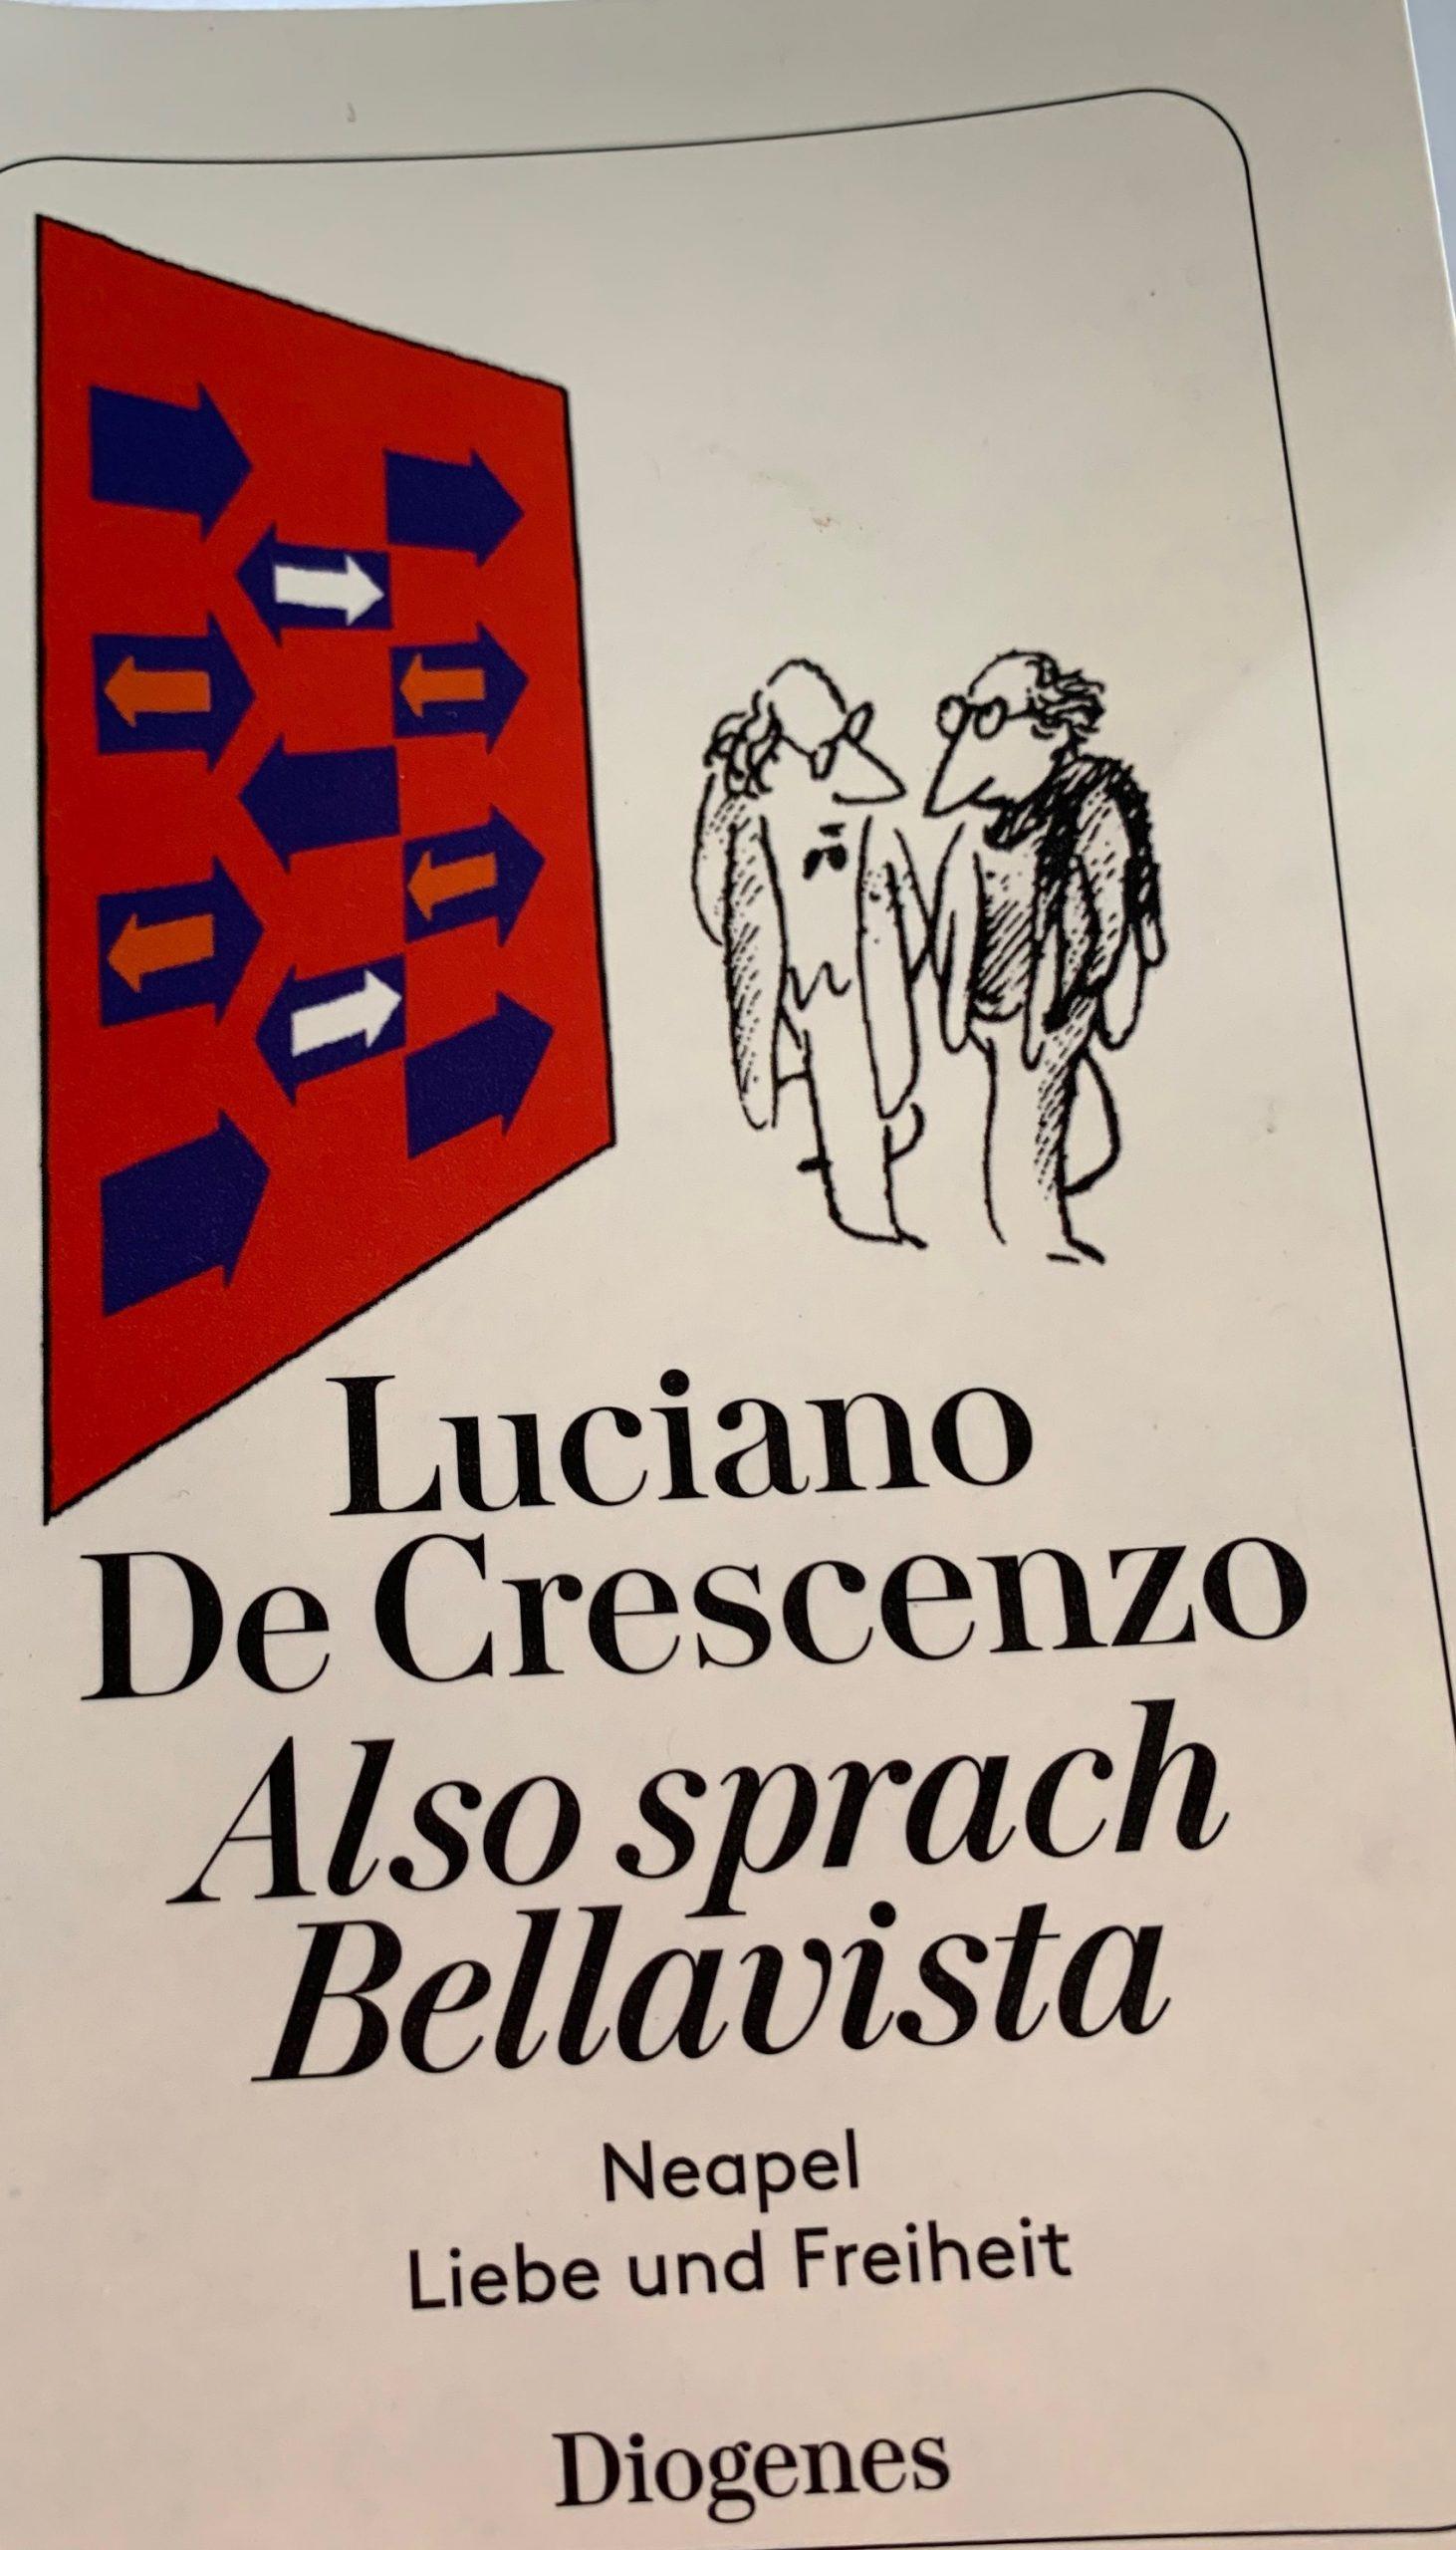 Luciano De Crescenzo - Also sprach Bellavista